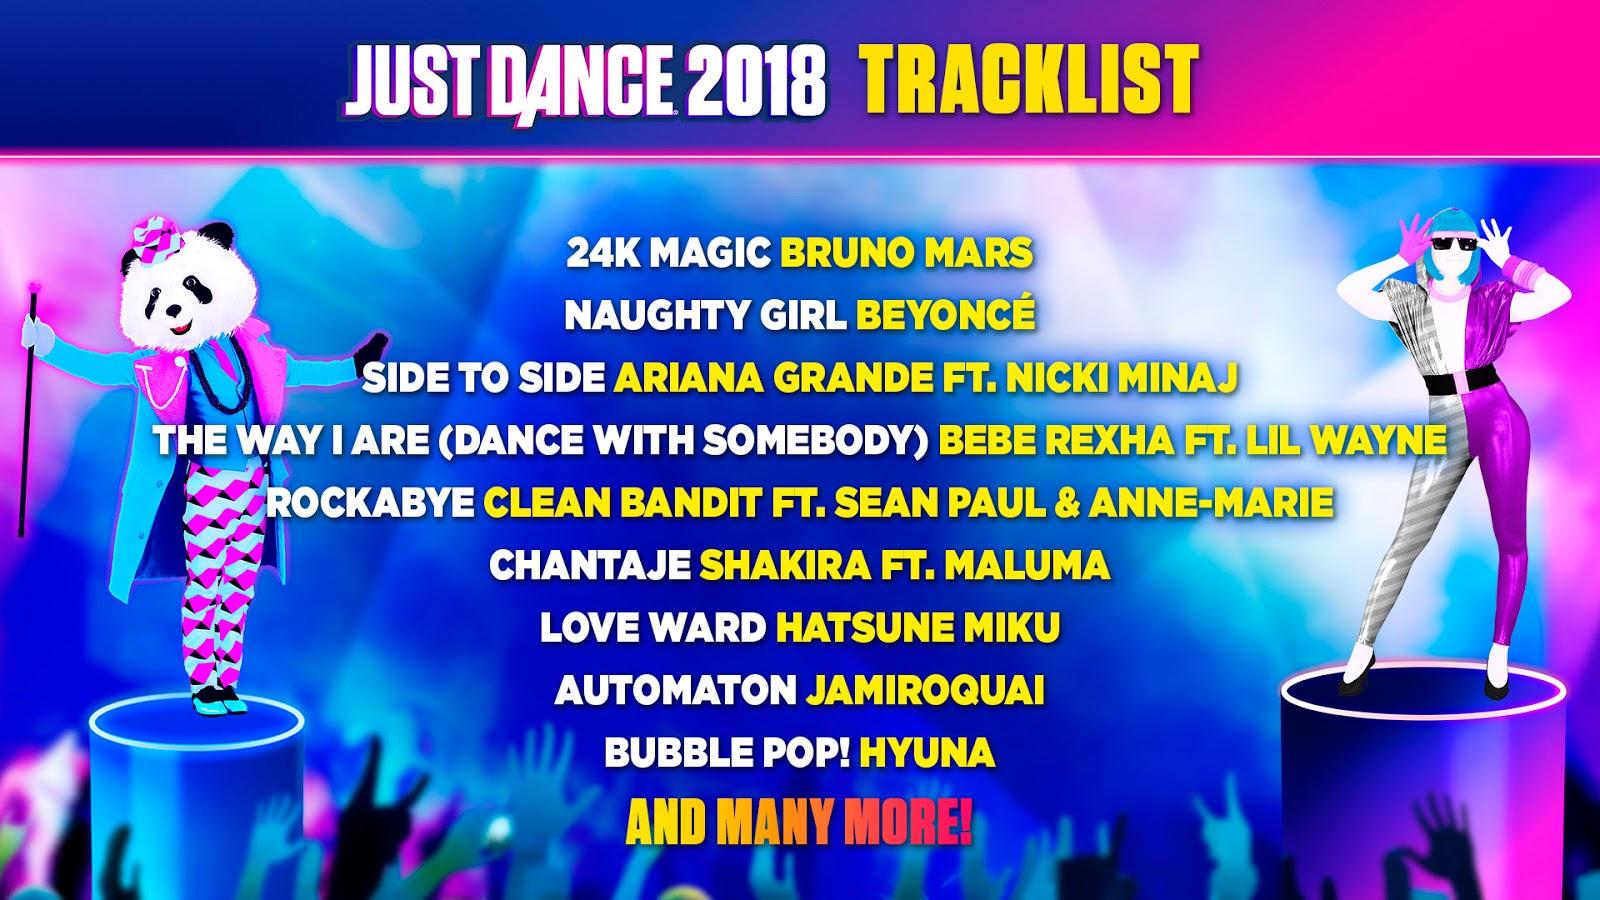 Mundo Drew Just Dance 2018 Ps4 Eur 4 55 Pkg V1 01 Espanol Pt